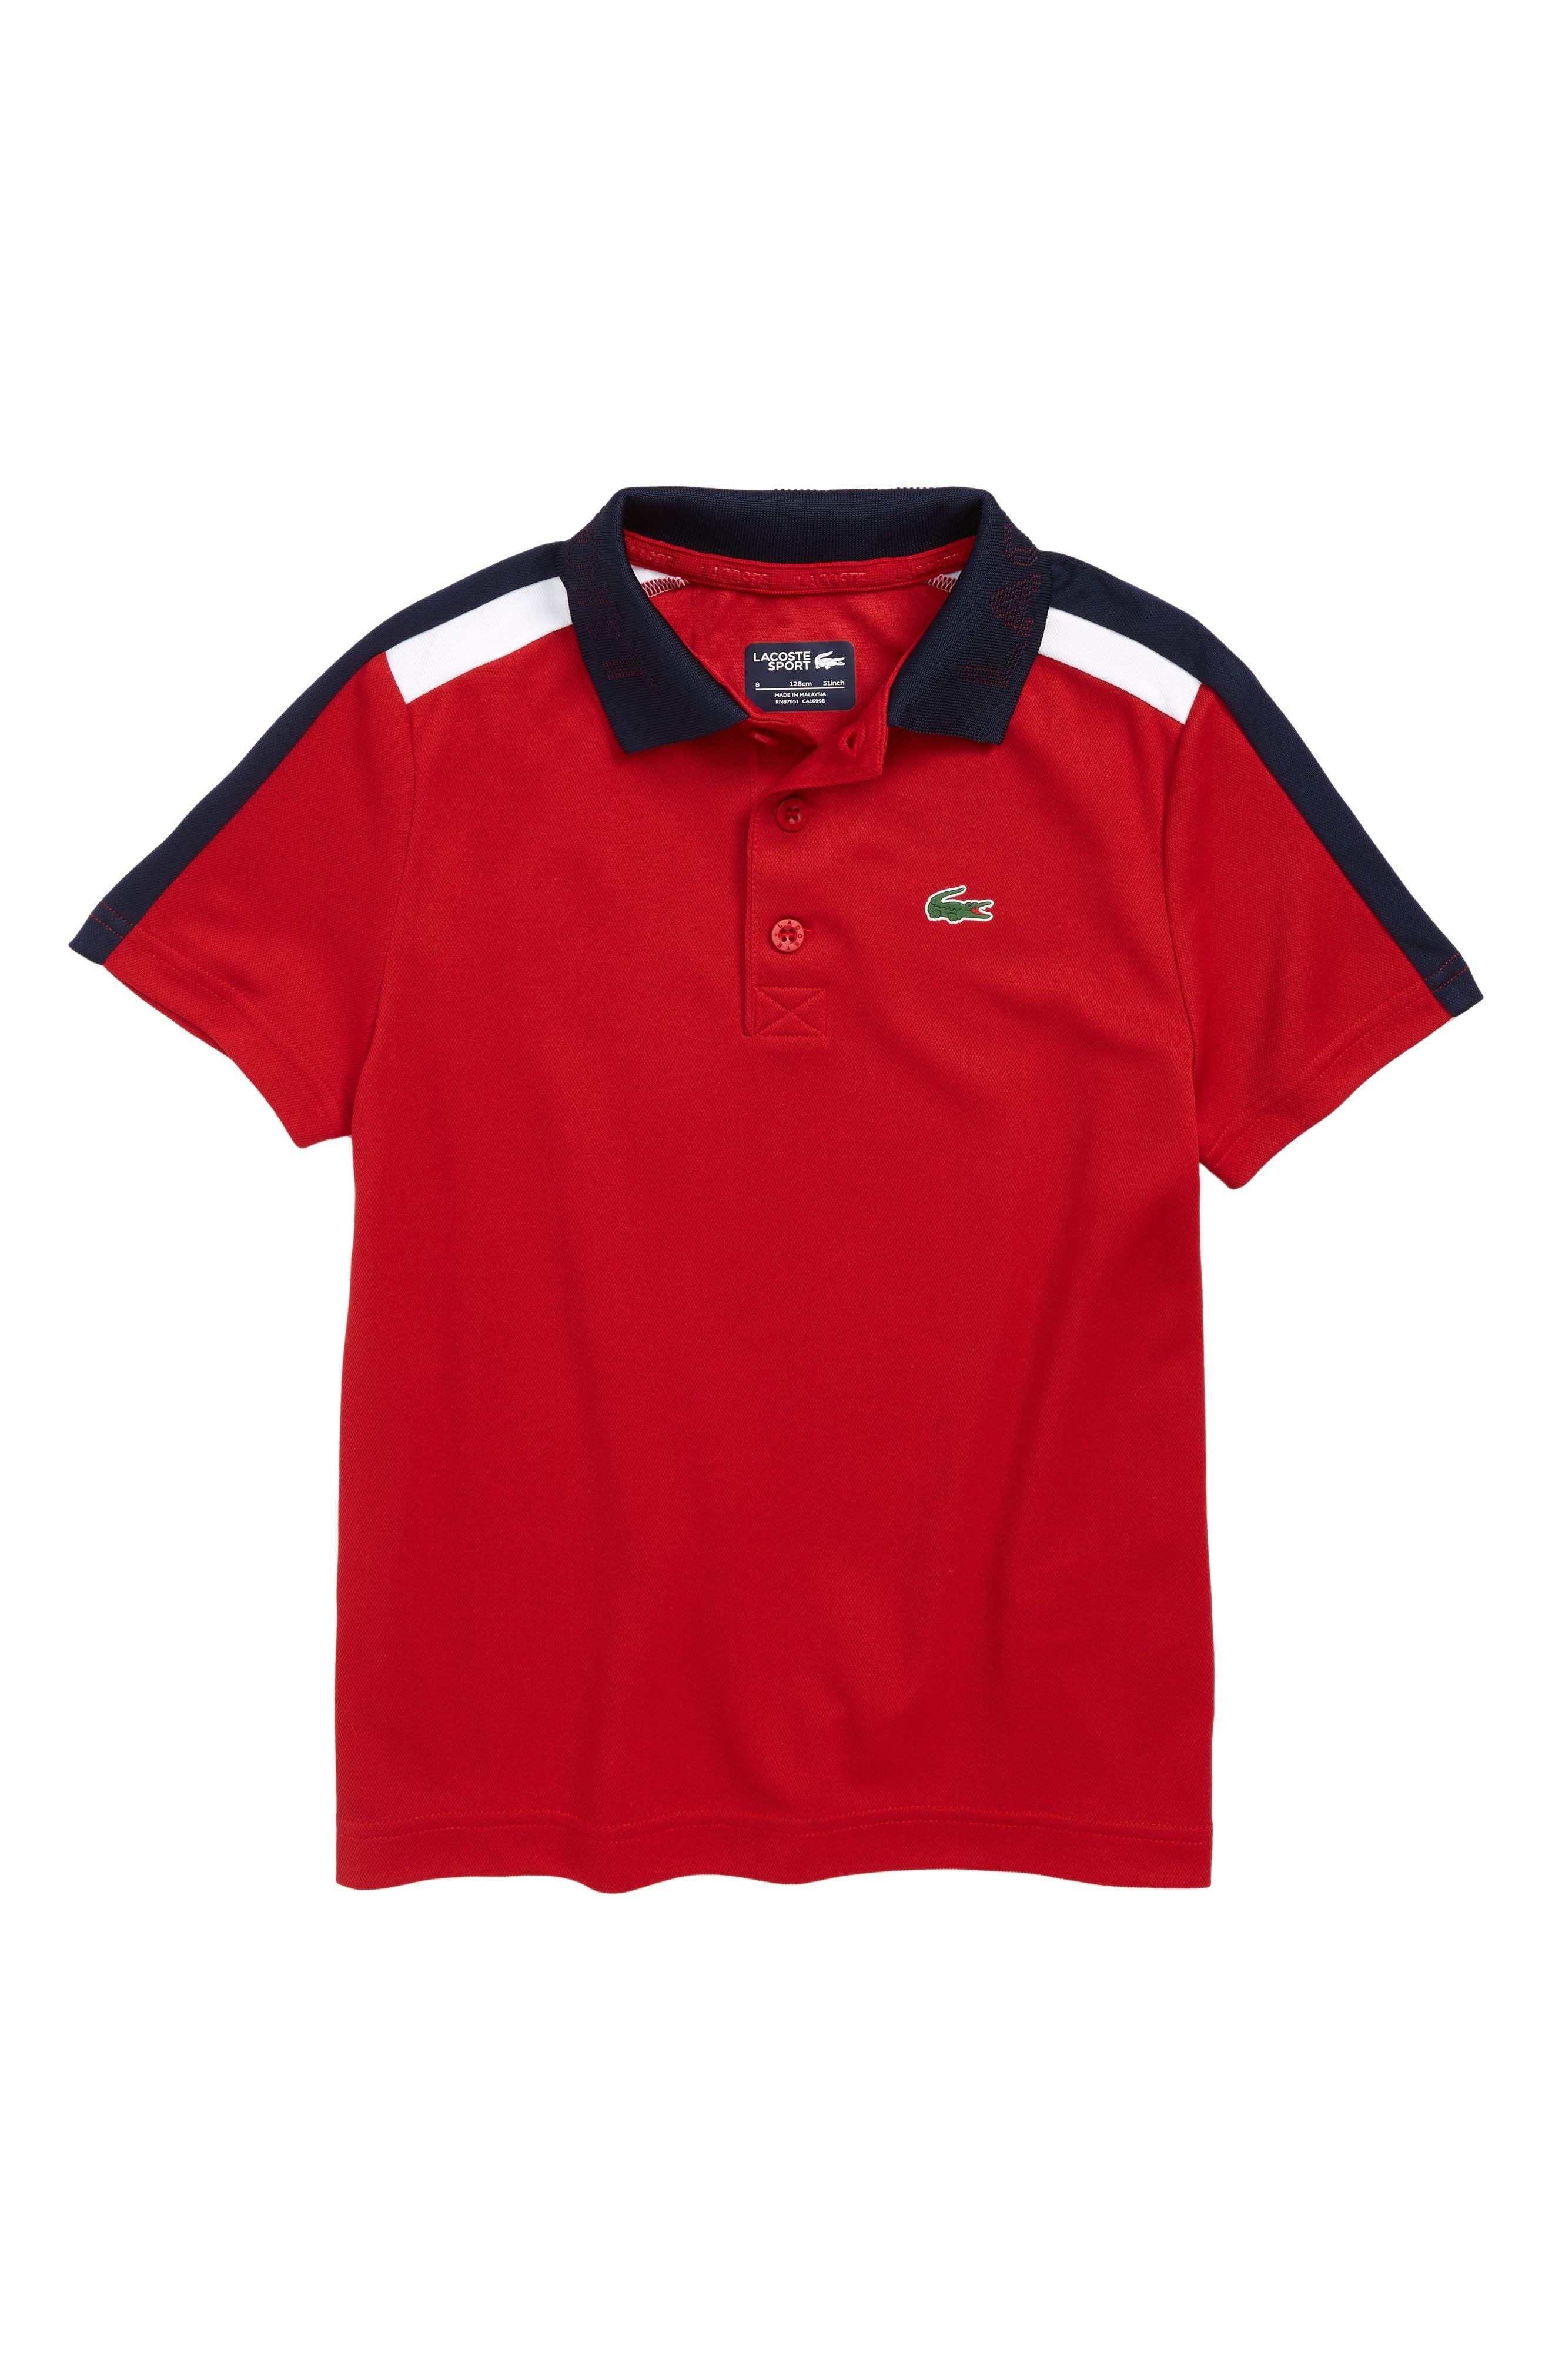 Boys Lacoste Colorblock Tennis Polo Size 4Y  White